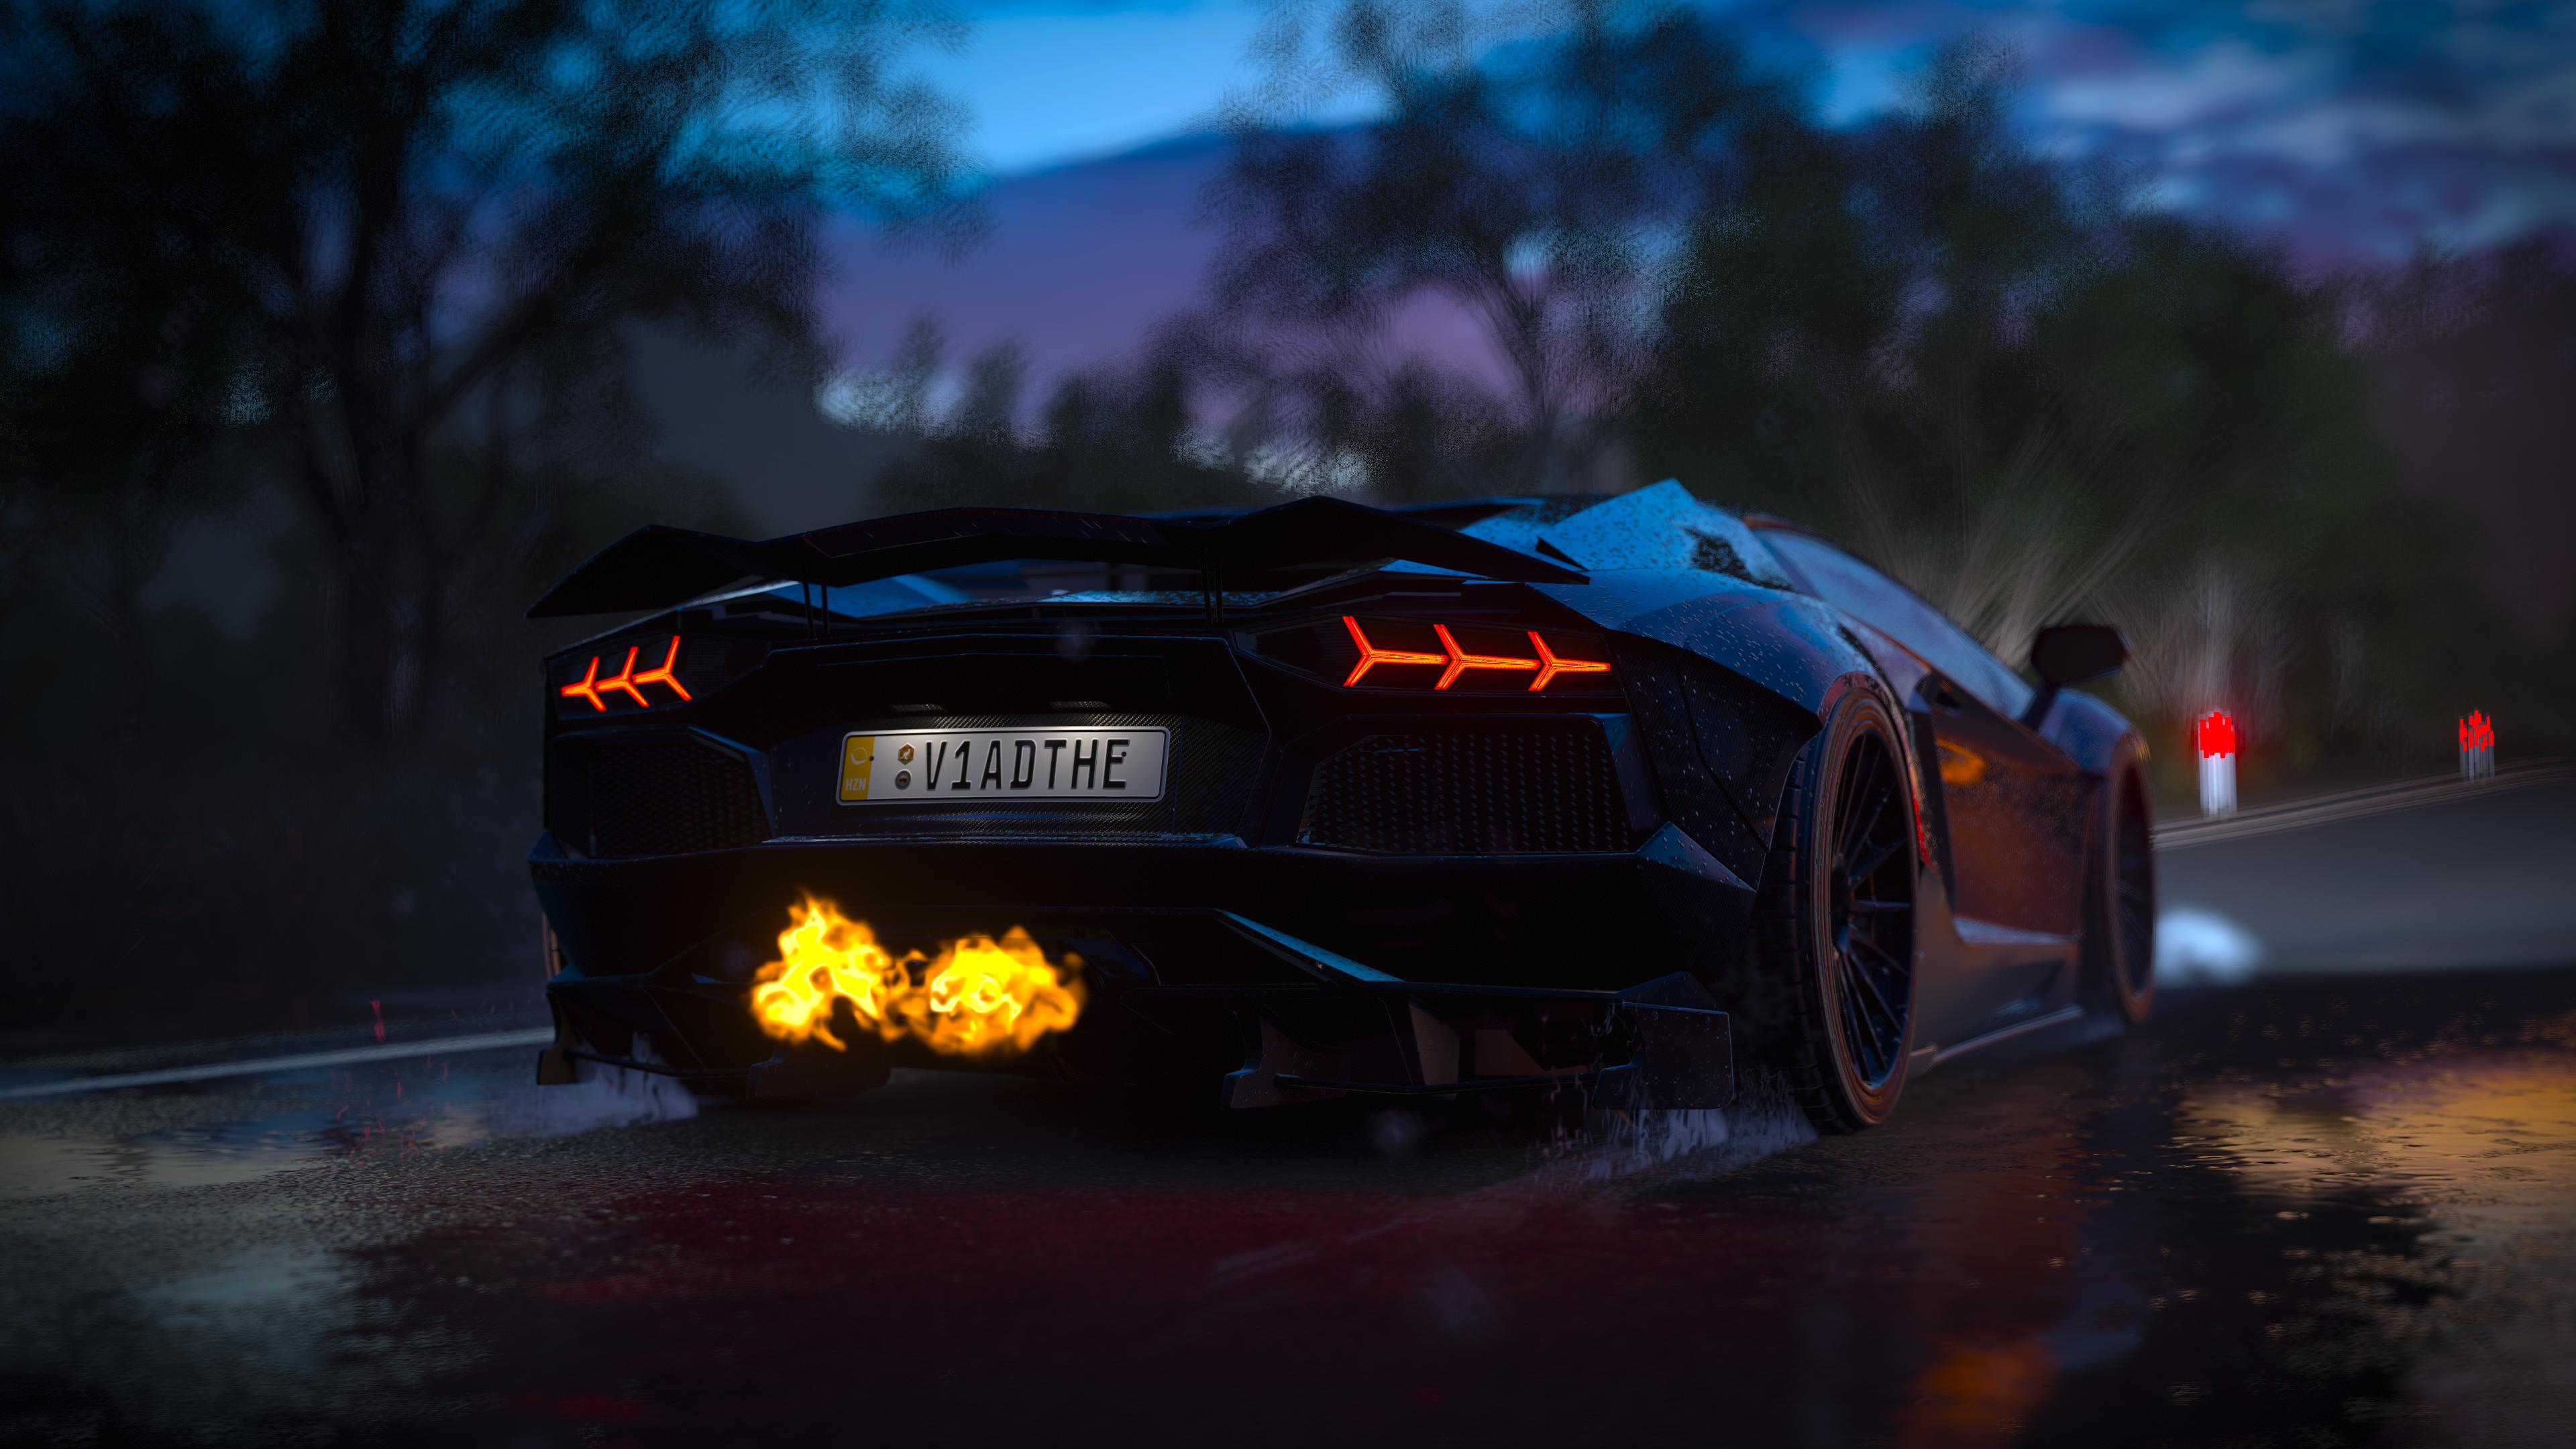 General 3840x2160 Forza Games forza horizon 3 Forza Horizon Lamborghini Aventador